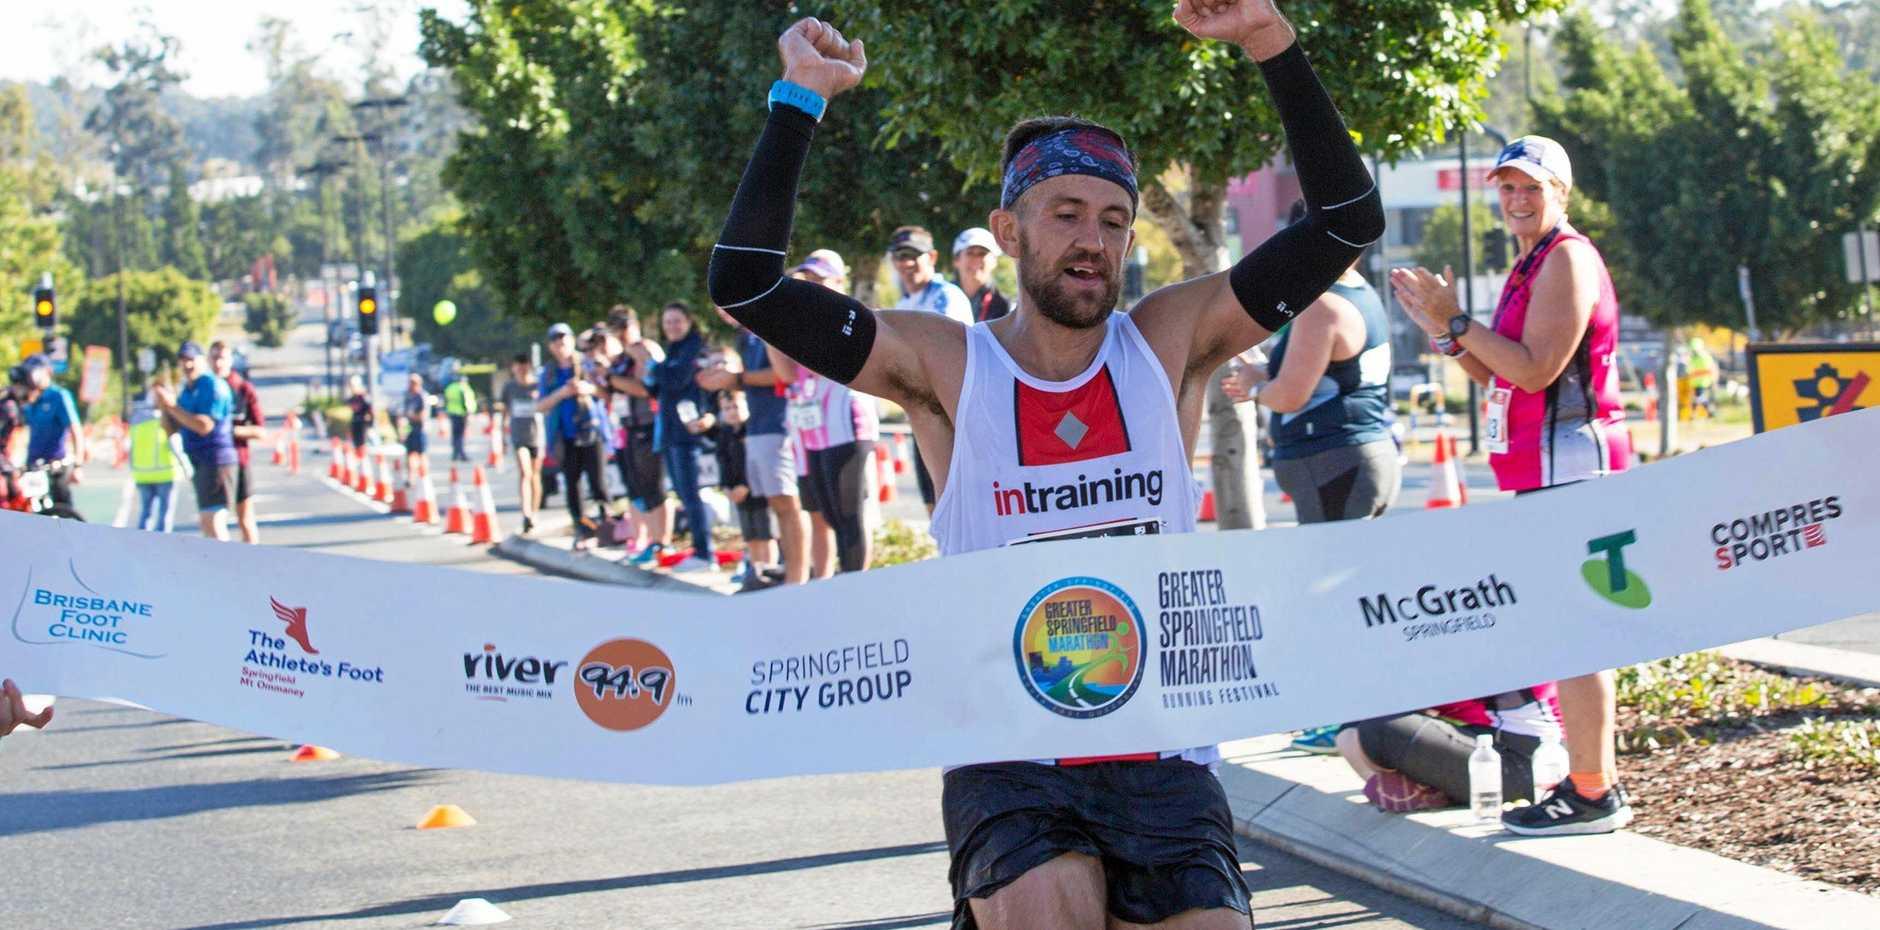 FANTASTIC FINISH: Ipswich marathon ace Clay Dawson crosses the line first to win the inaugural Greater Springfield Marathon.